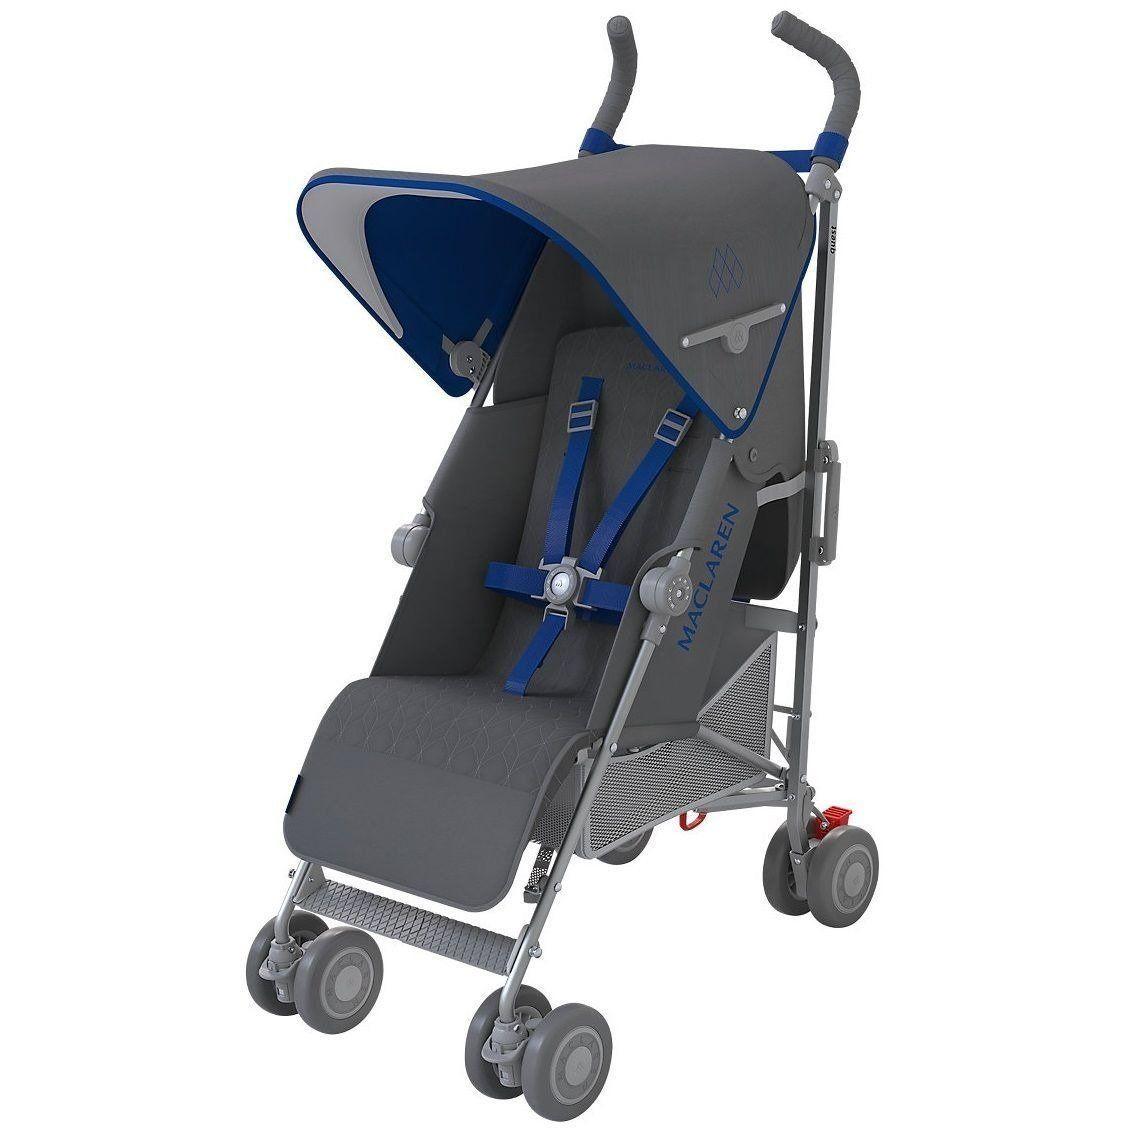 Maclaren Quest Baby Lightweight Single Stroller Charcoal